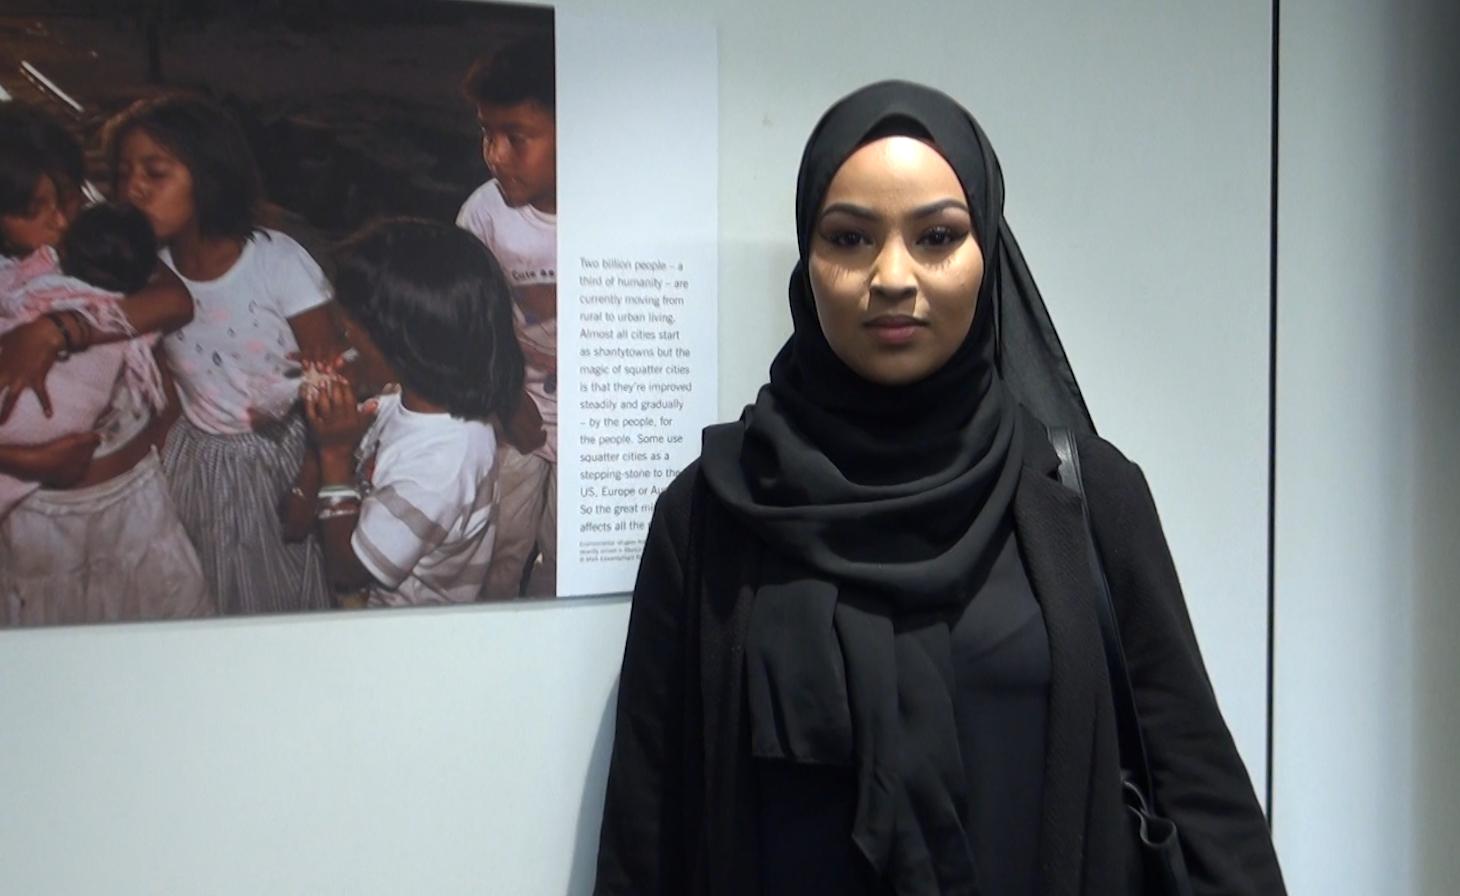 Watch modern hijabi fashion in action on the corridors of KU – Video